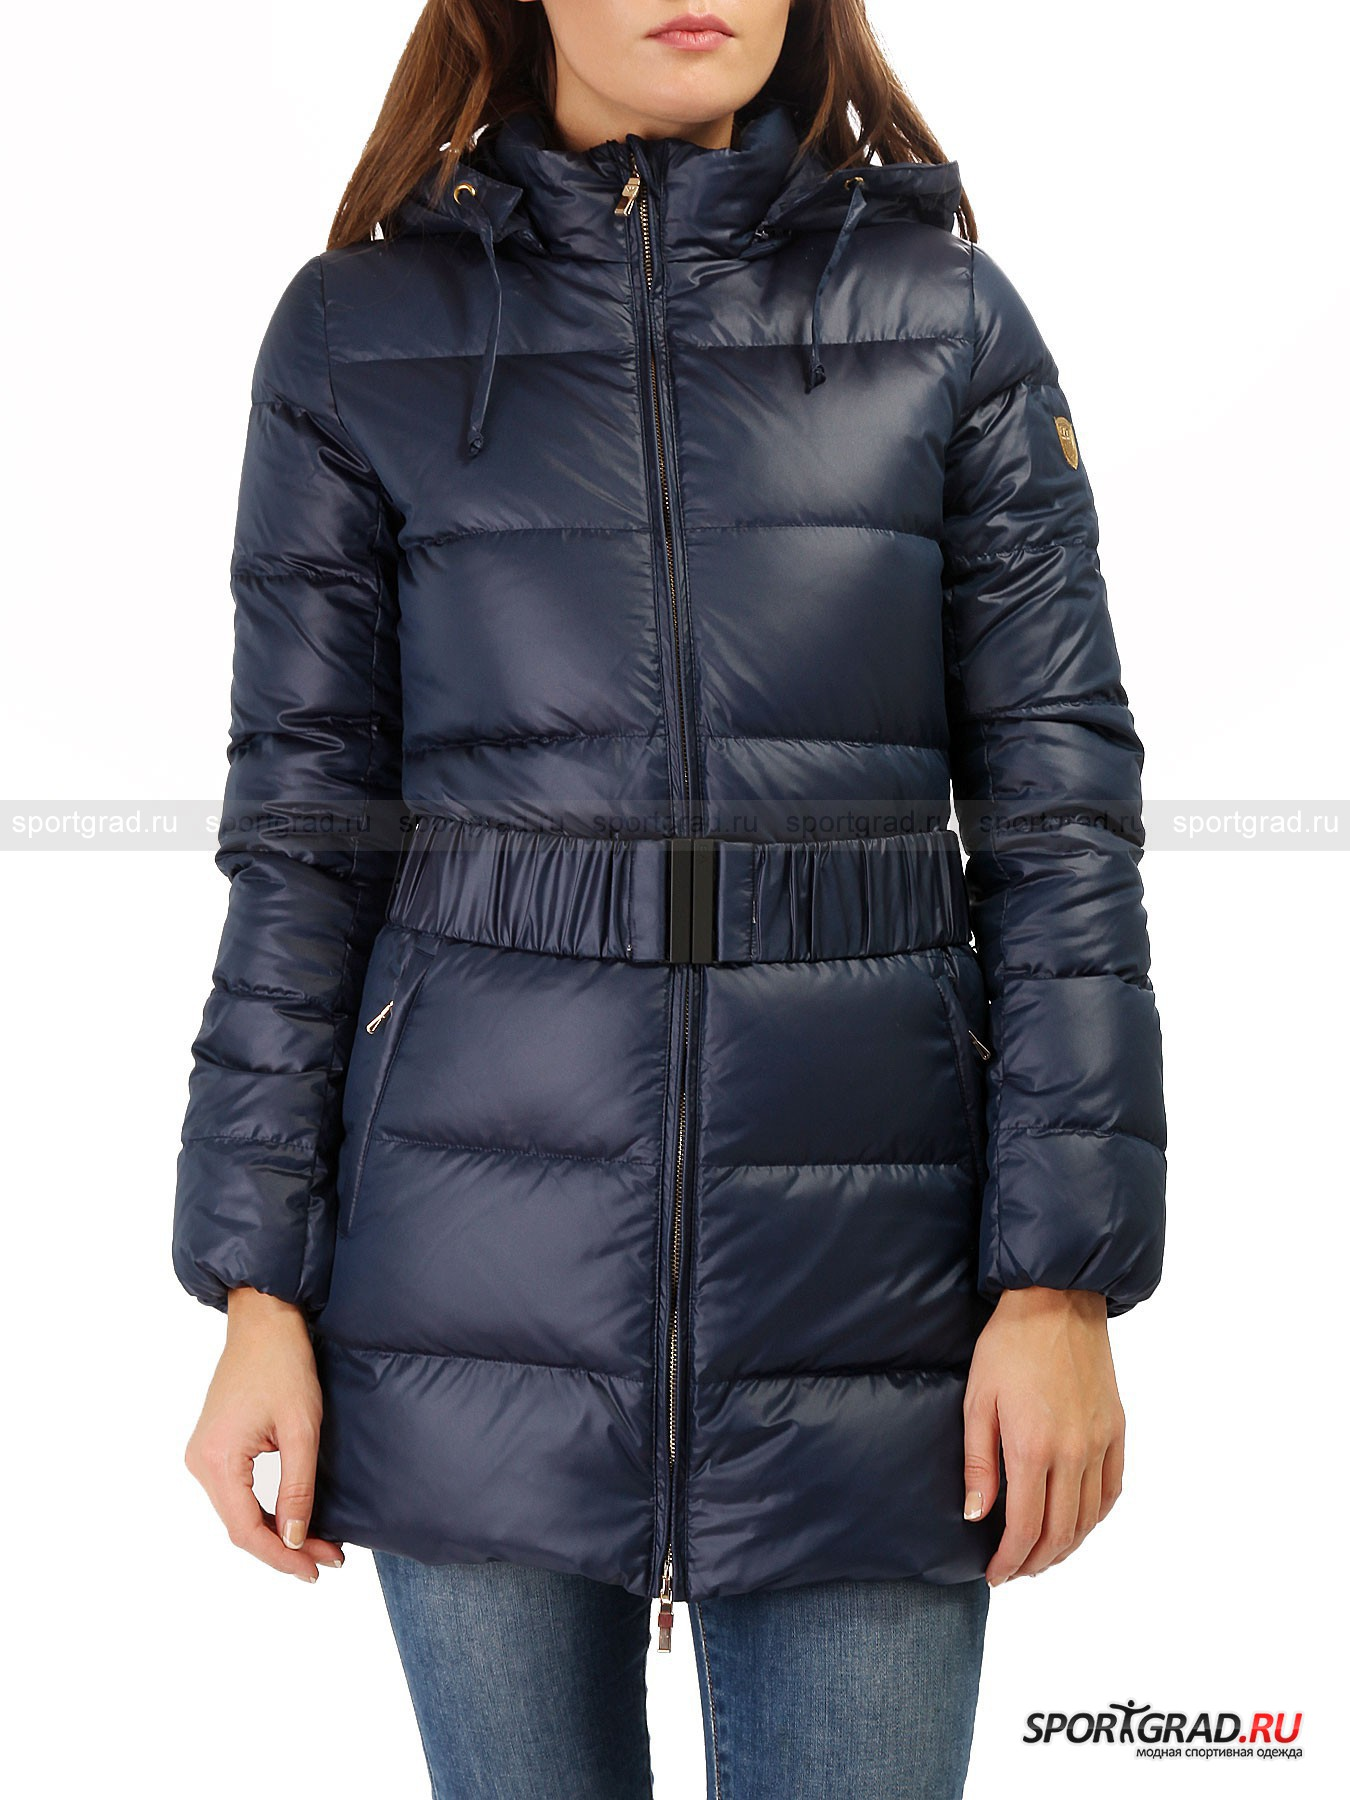 Пальто пуховое Mountain Pure Down Jacket EA7 EMPORIO ARMANI